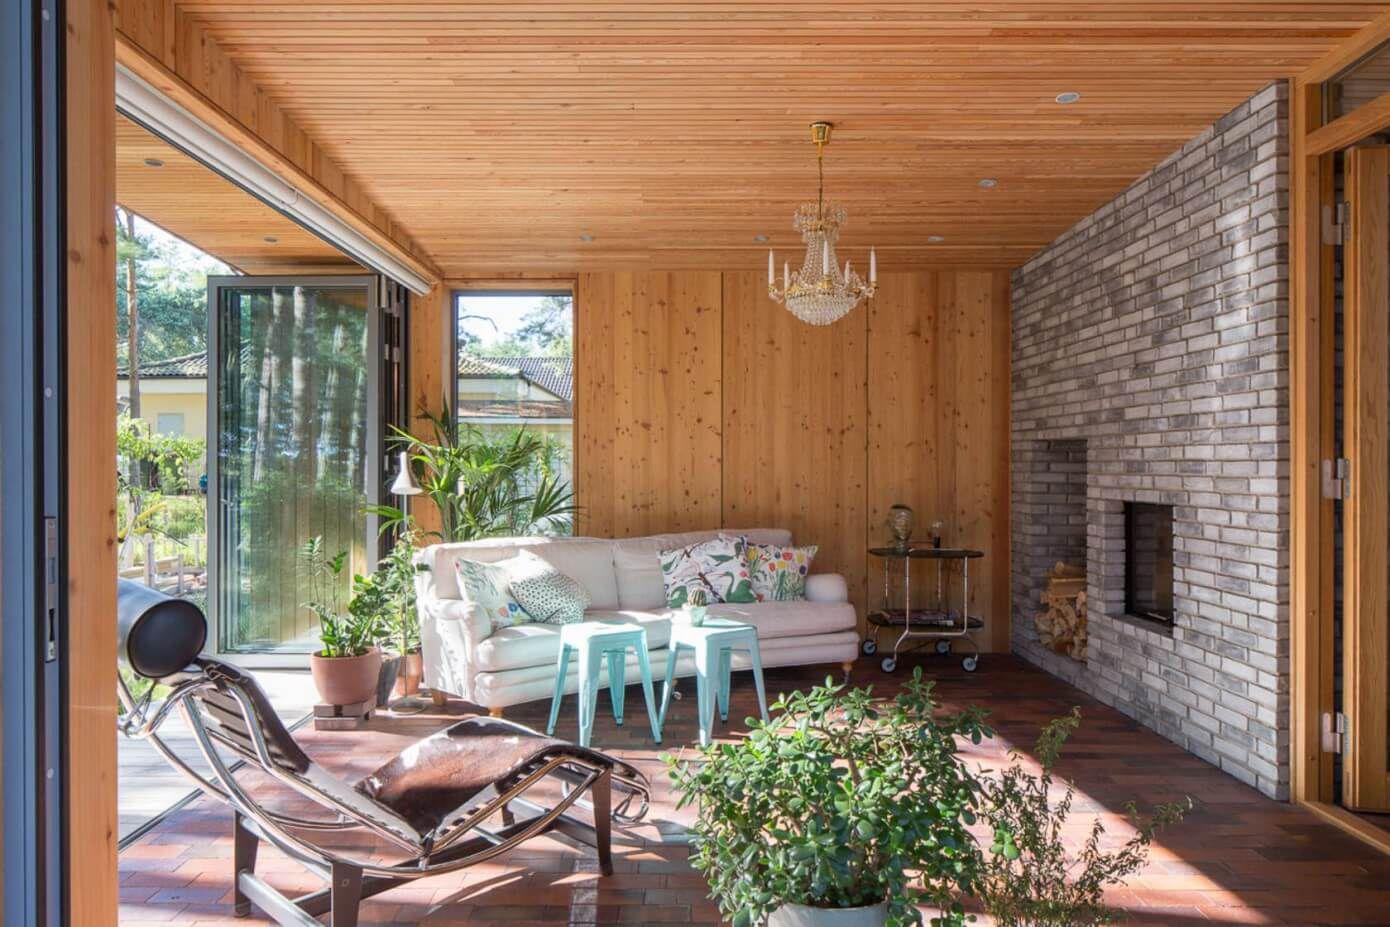 open nature living room wooden interior